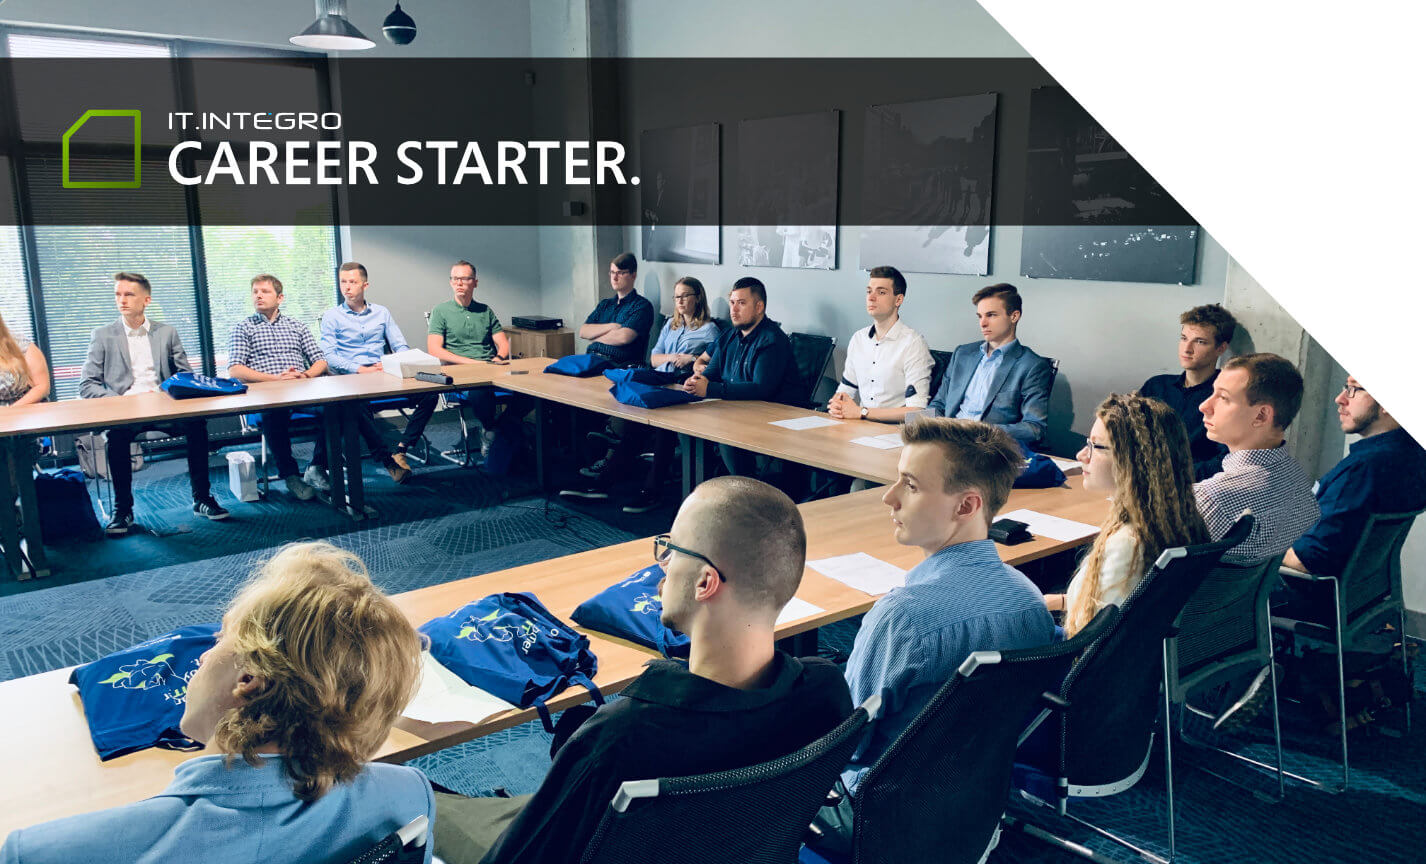 Podsumowanie stażu Career Starter 2019 w IT.integro